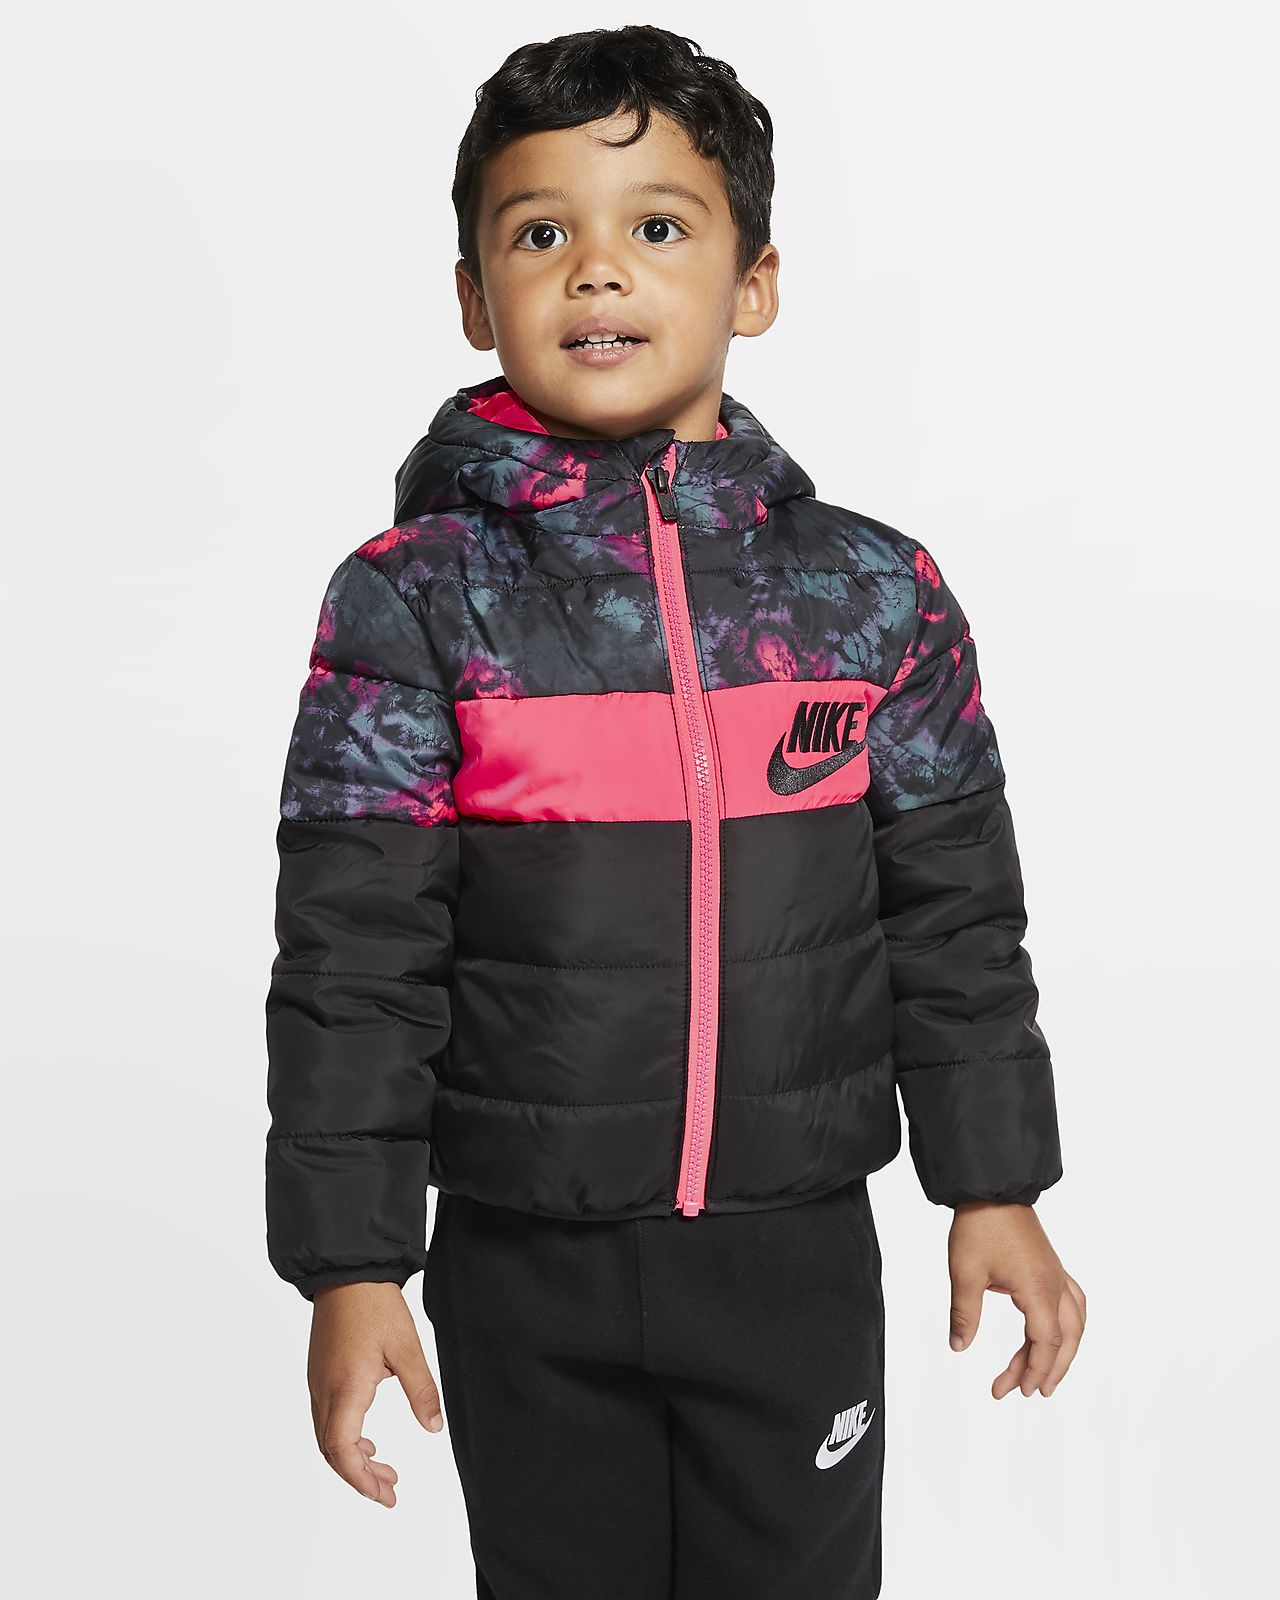 Nike Sportswear Toddler Full-Zip Puffer Jacket